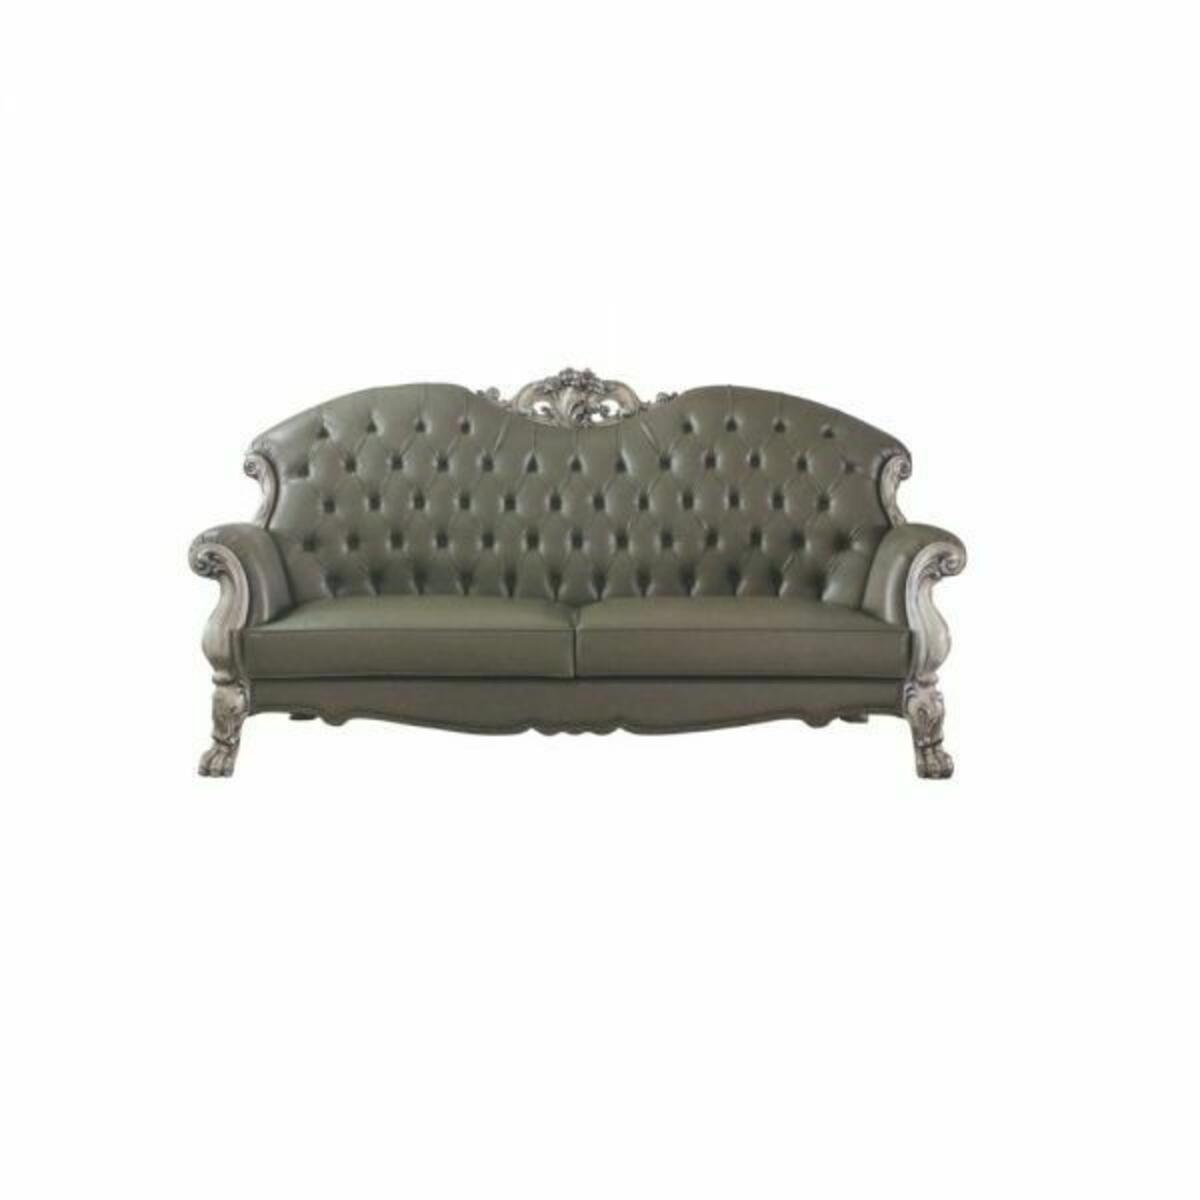 ACME Dresden Sofa w/5 Pillows - 58175 - Traditional, Vintage - PU, Frame: Wood (Poplar, Ply), Poly-Resin (Fiberglass) - Vintage Bone White and PU